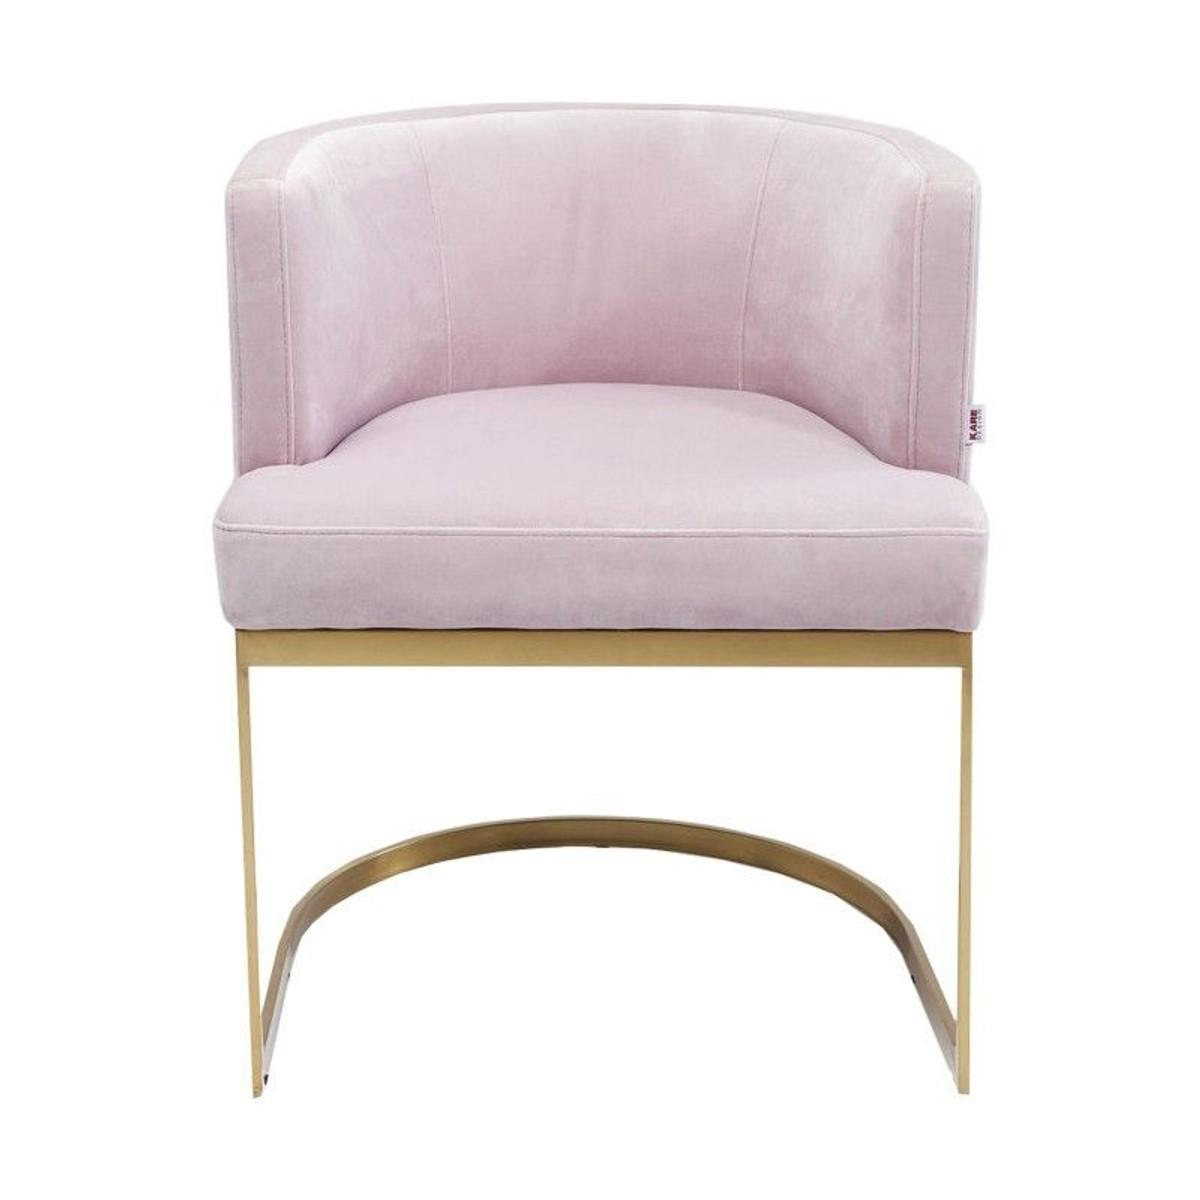 Chaise Avec Accoudoirs Rumba Rose Kare Design En 2019 Products Design Vanity Bench Et Furniture